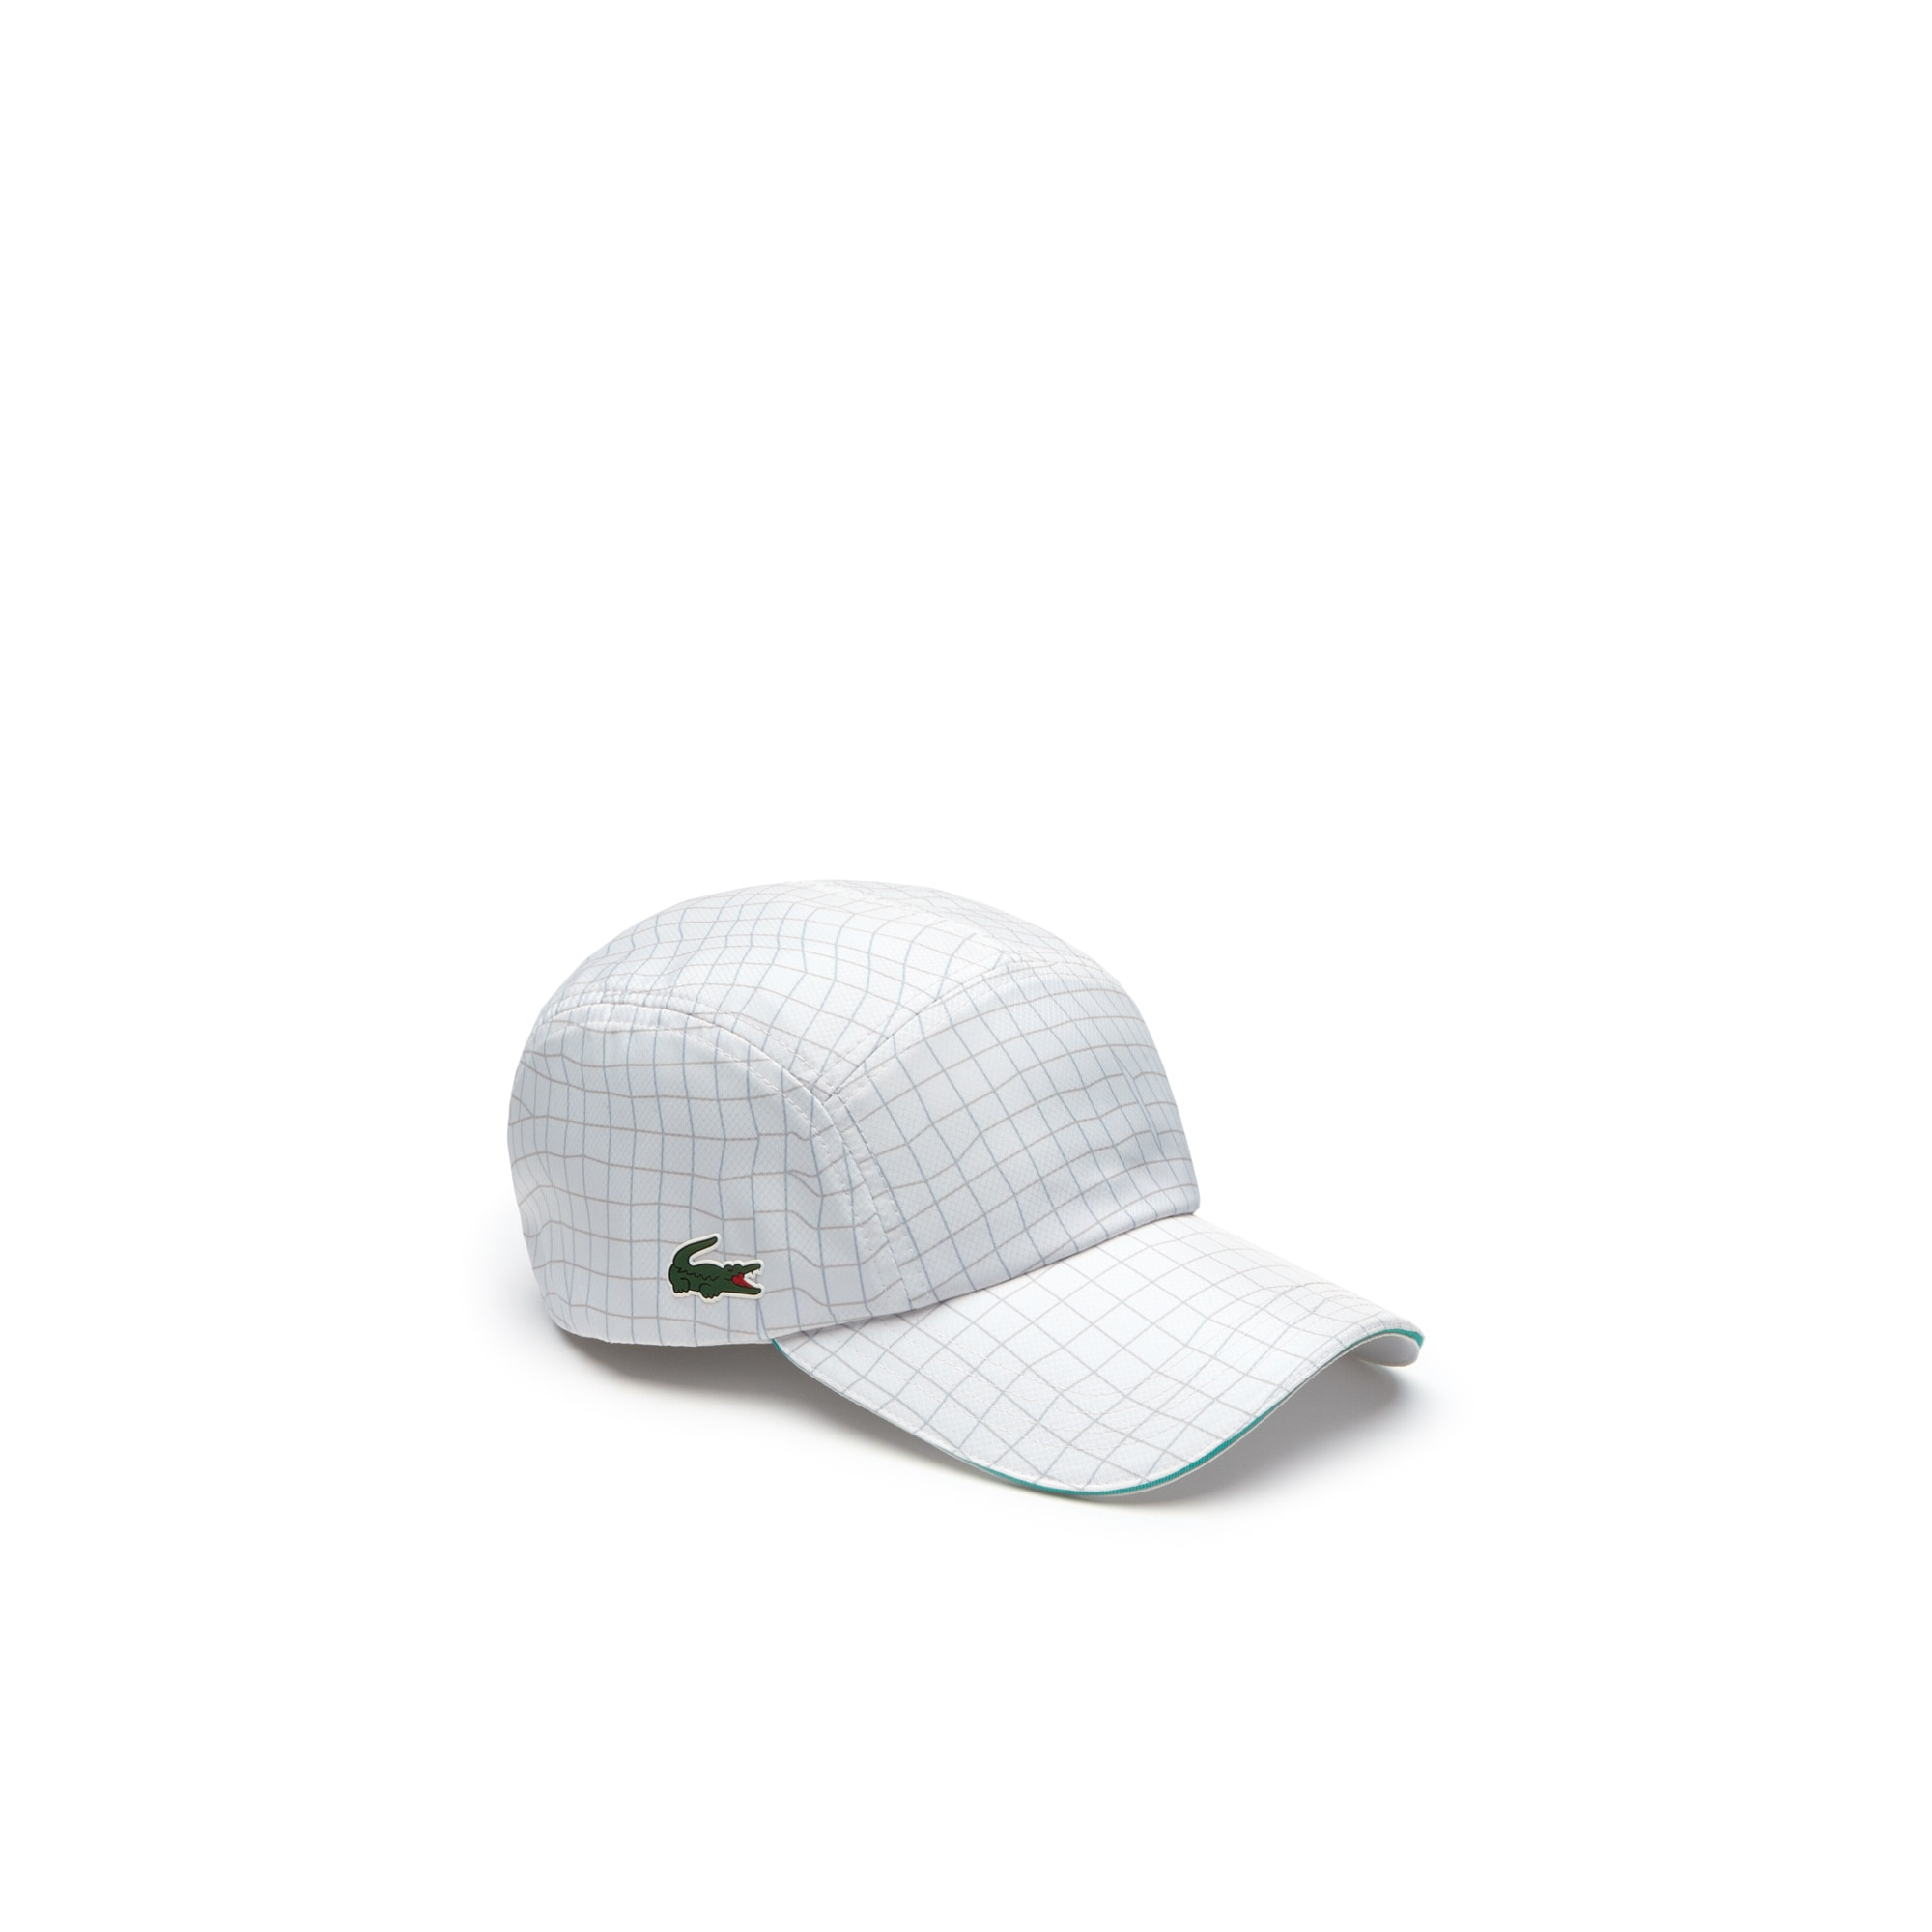 Men's Lacoste SPORT Tennis Colorblock Taffeta Cap